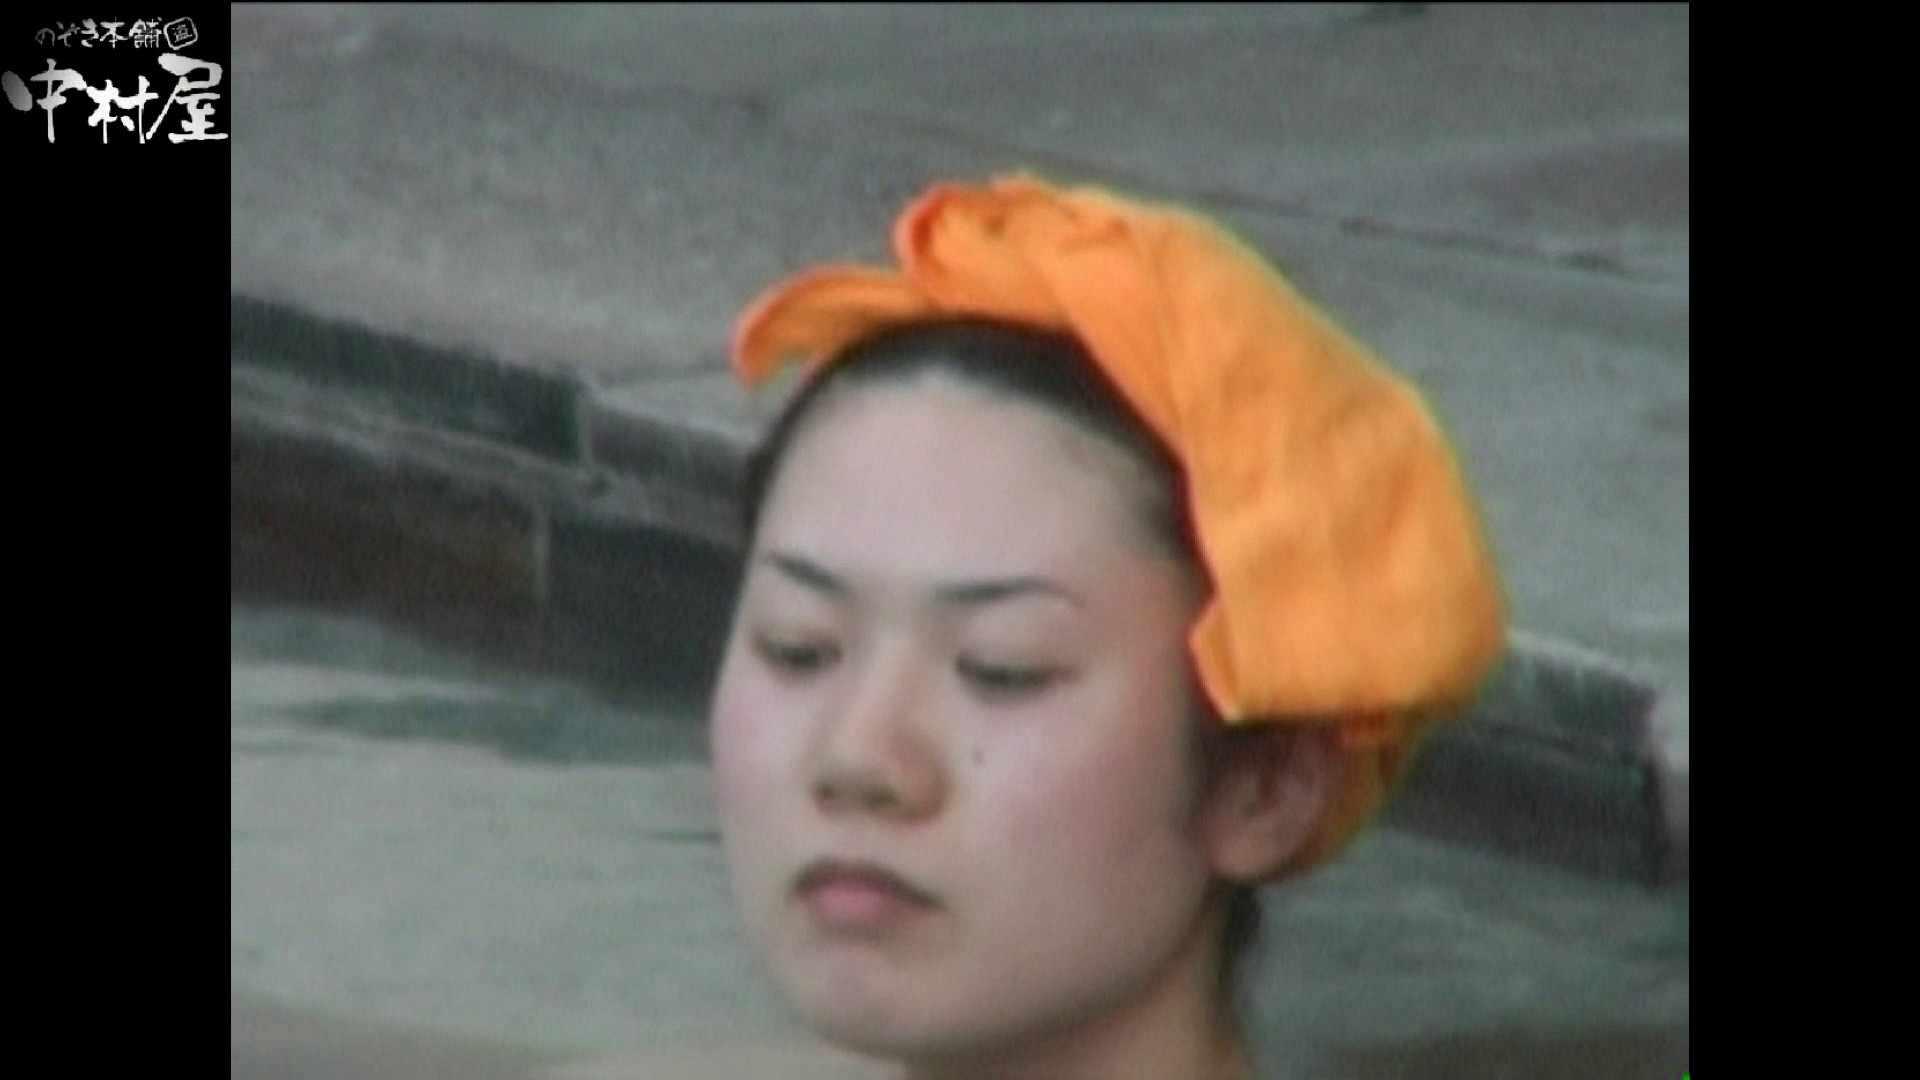 Aquaな露天風呂Vol.978 OL女体  88連発 15